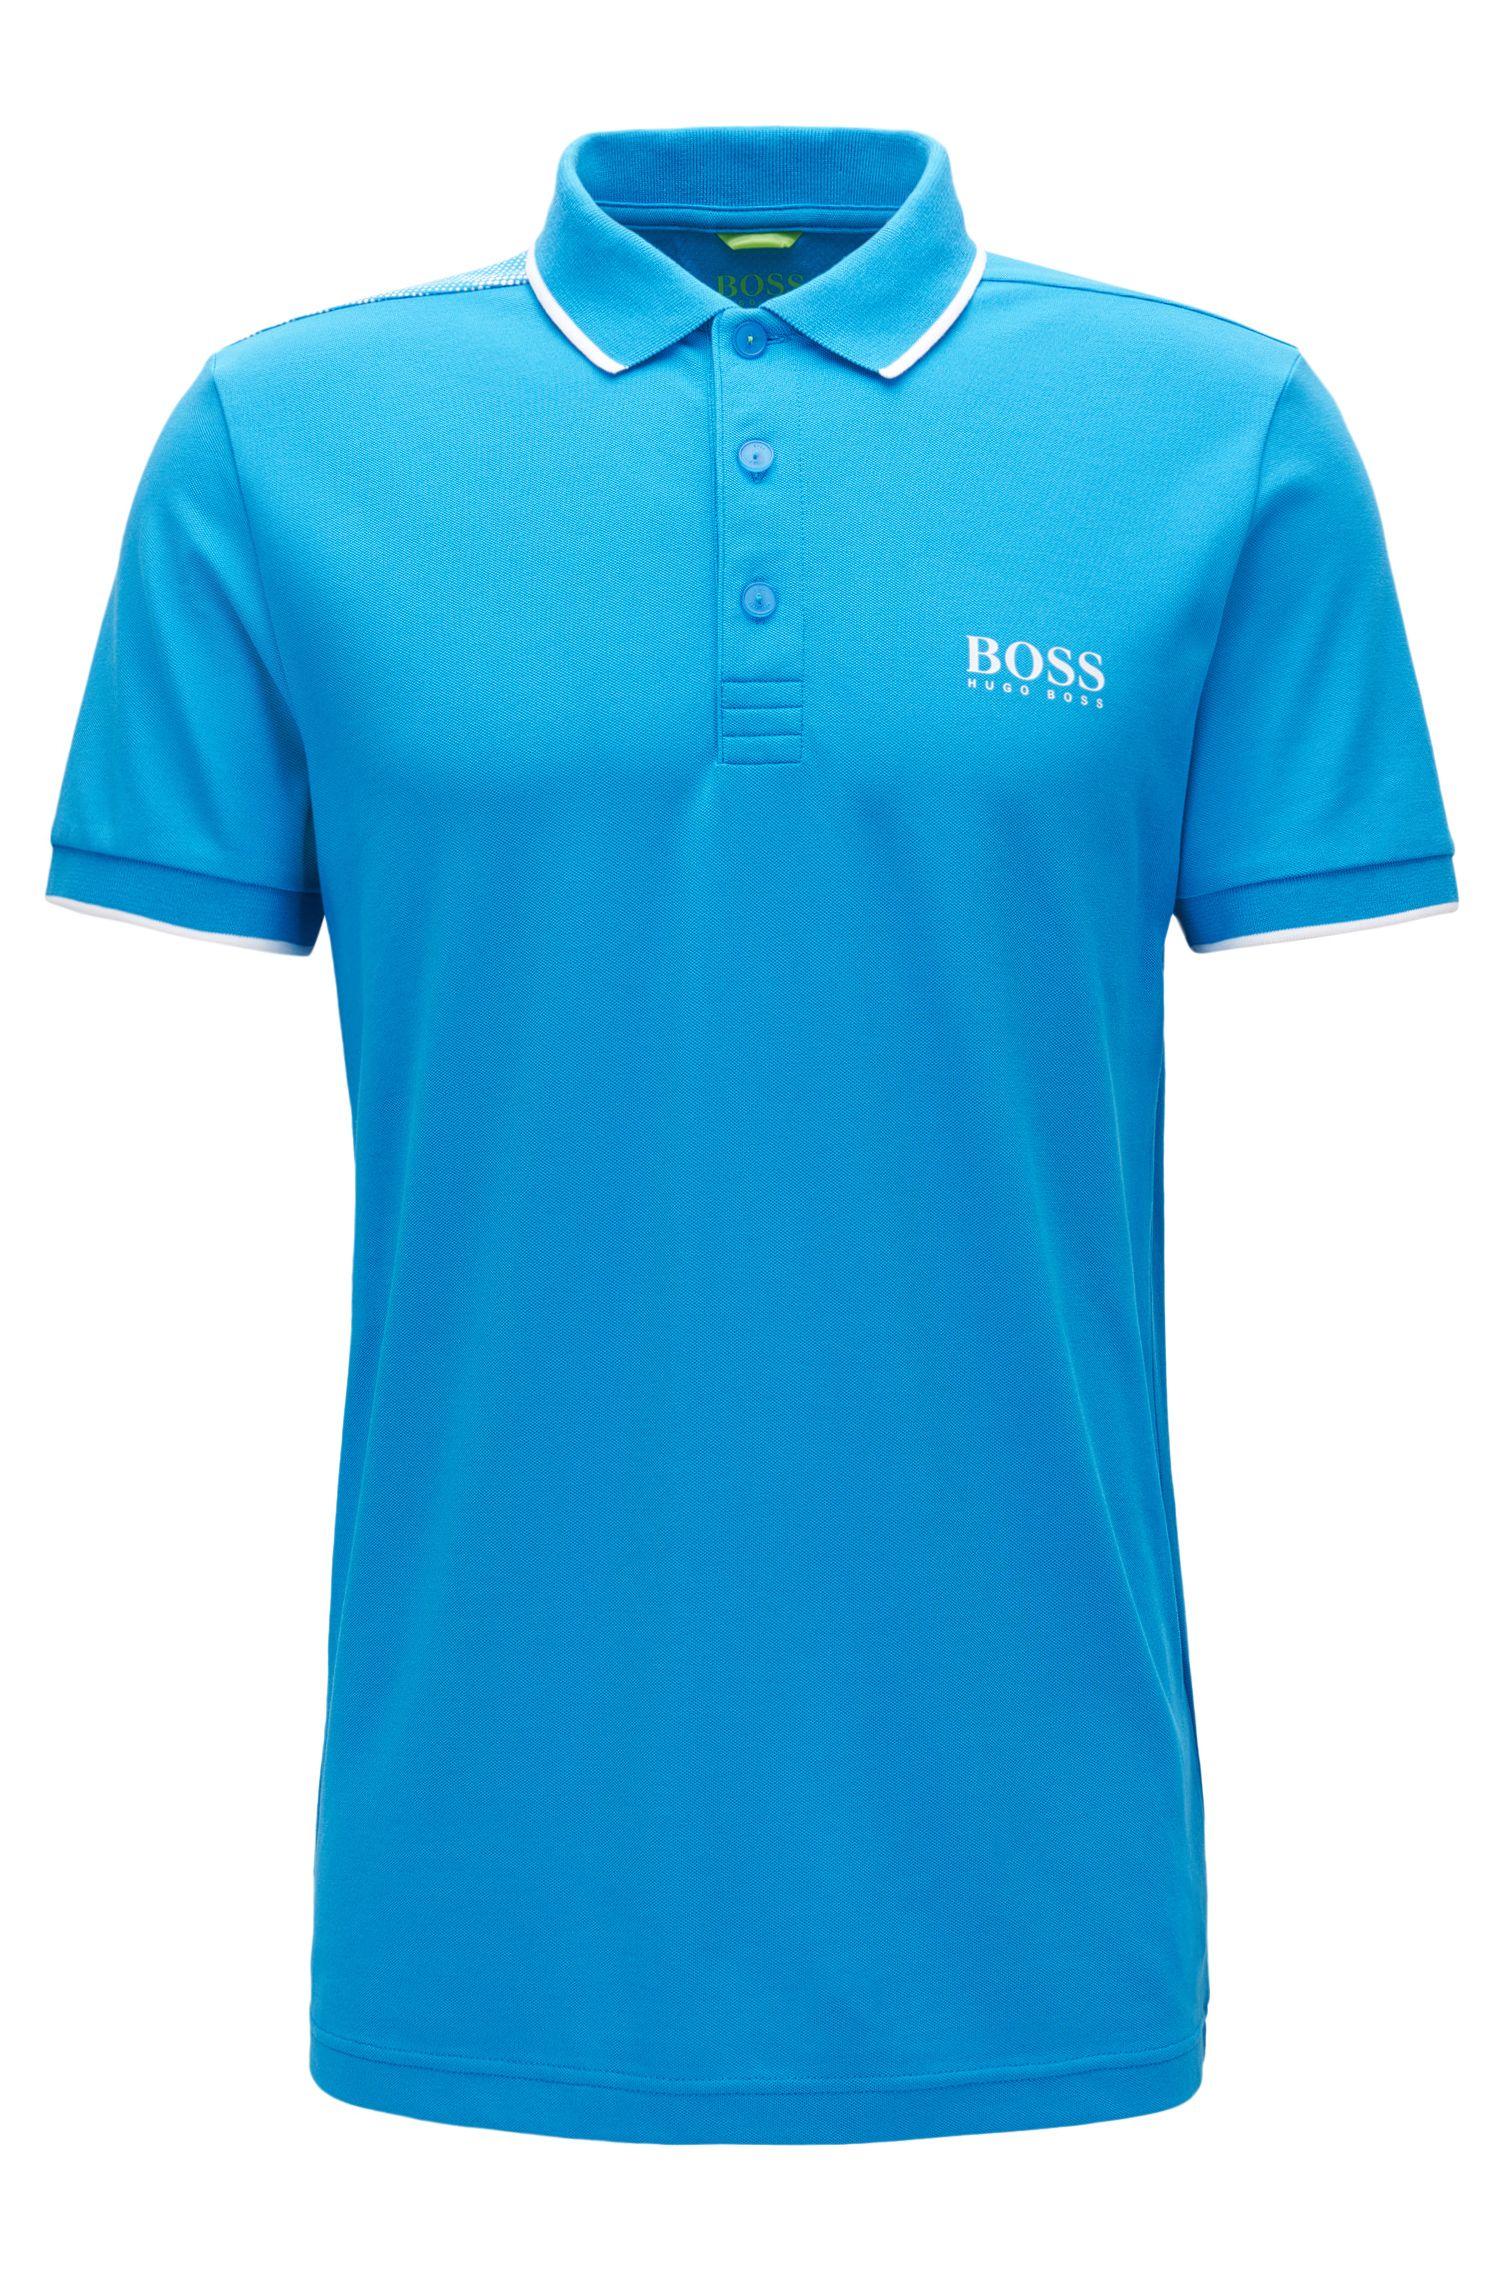 Tipped Cotton Blend  Polo Shirt, Slim Fit   Paul Pro